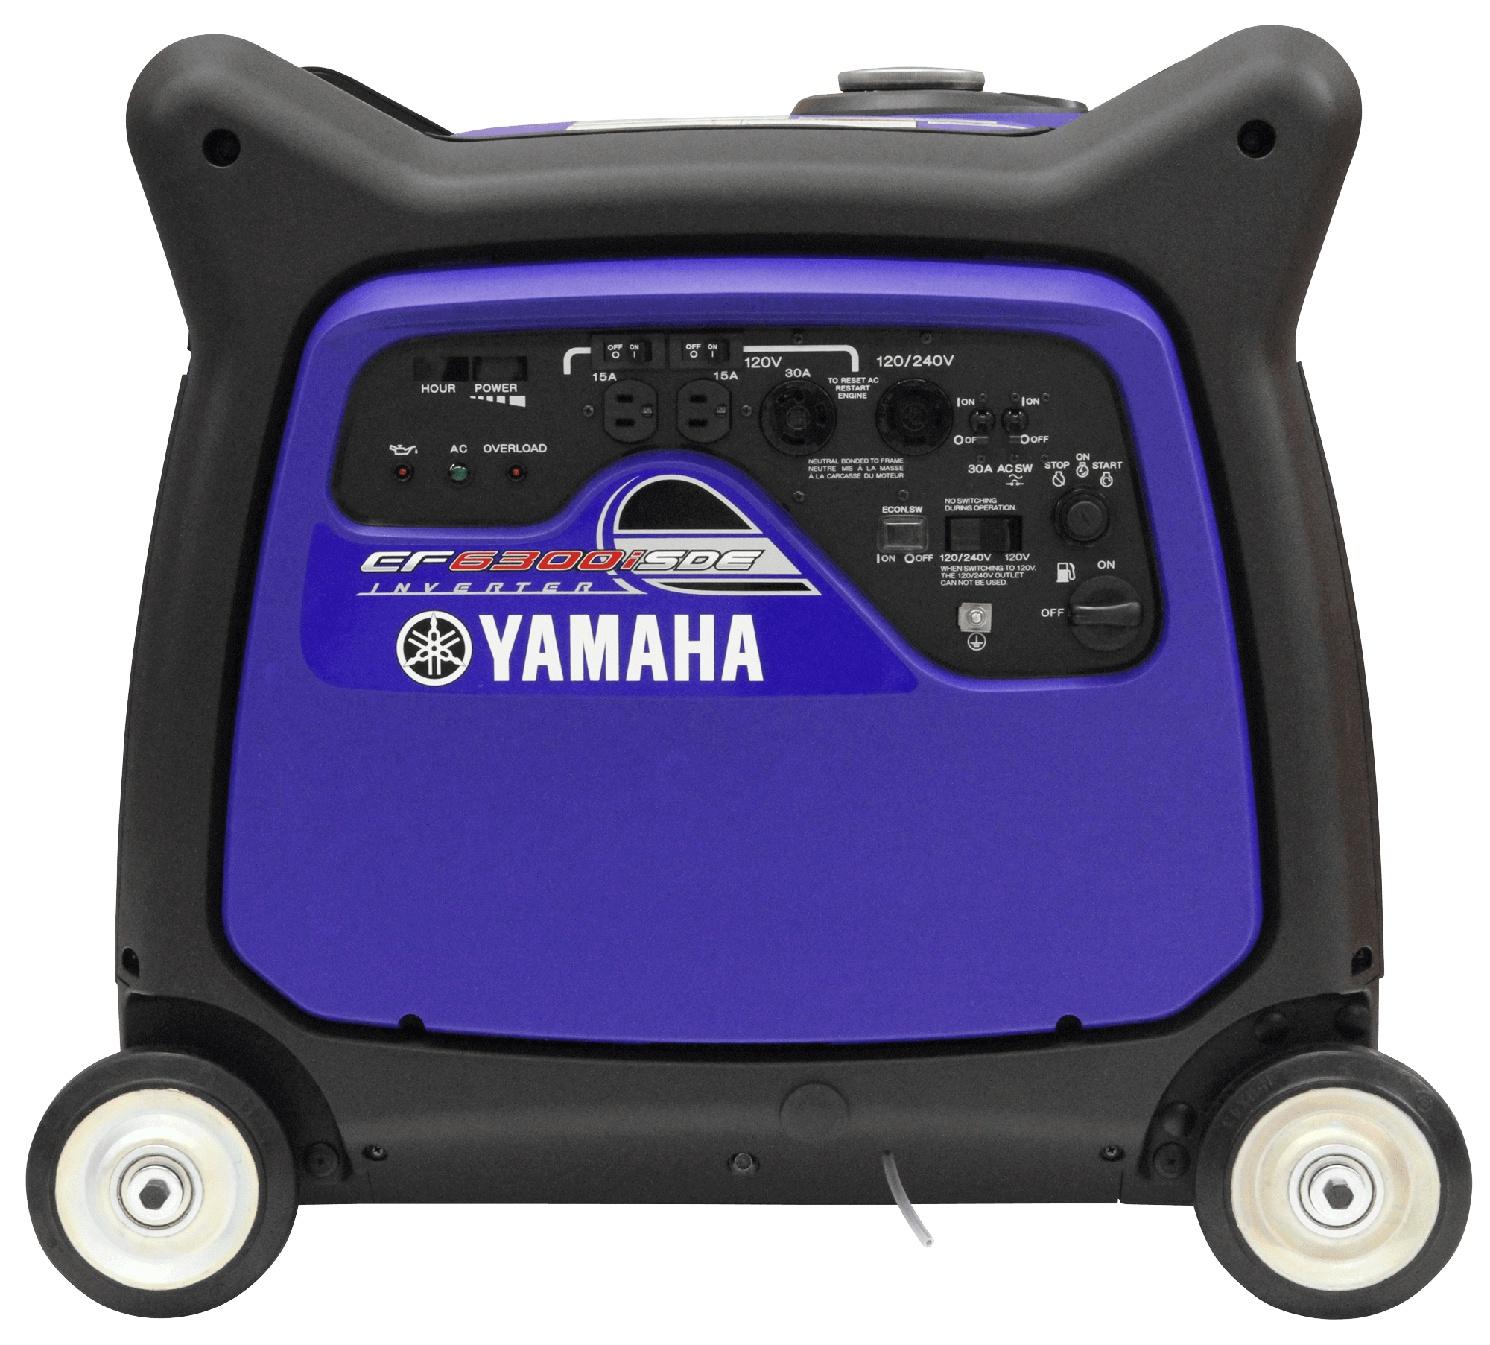 Yamaha Génératrices à inverseur EF6300ISDE